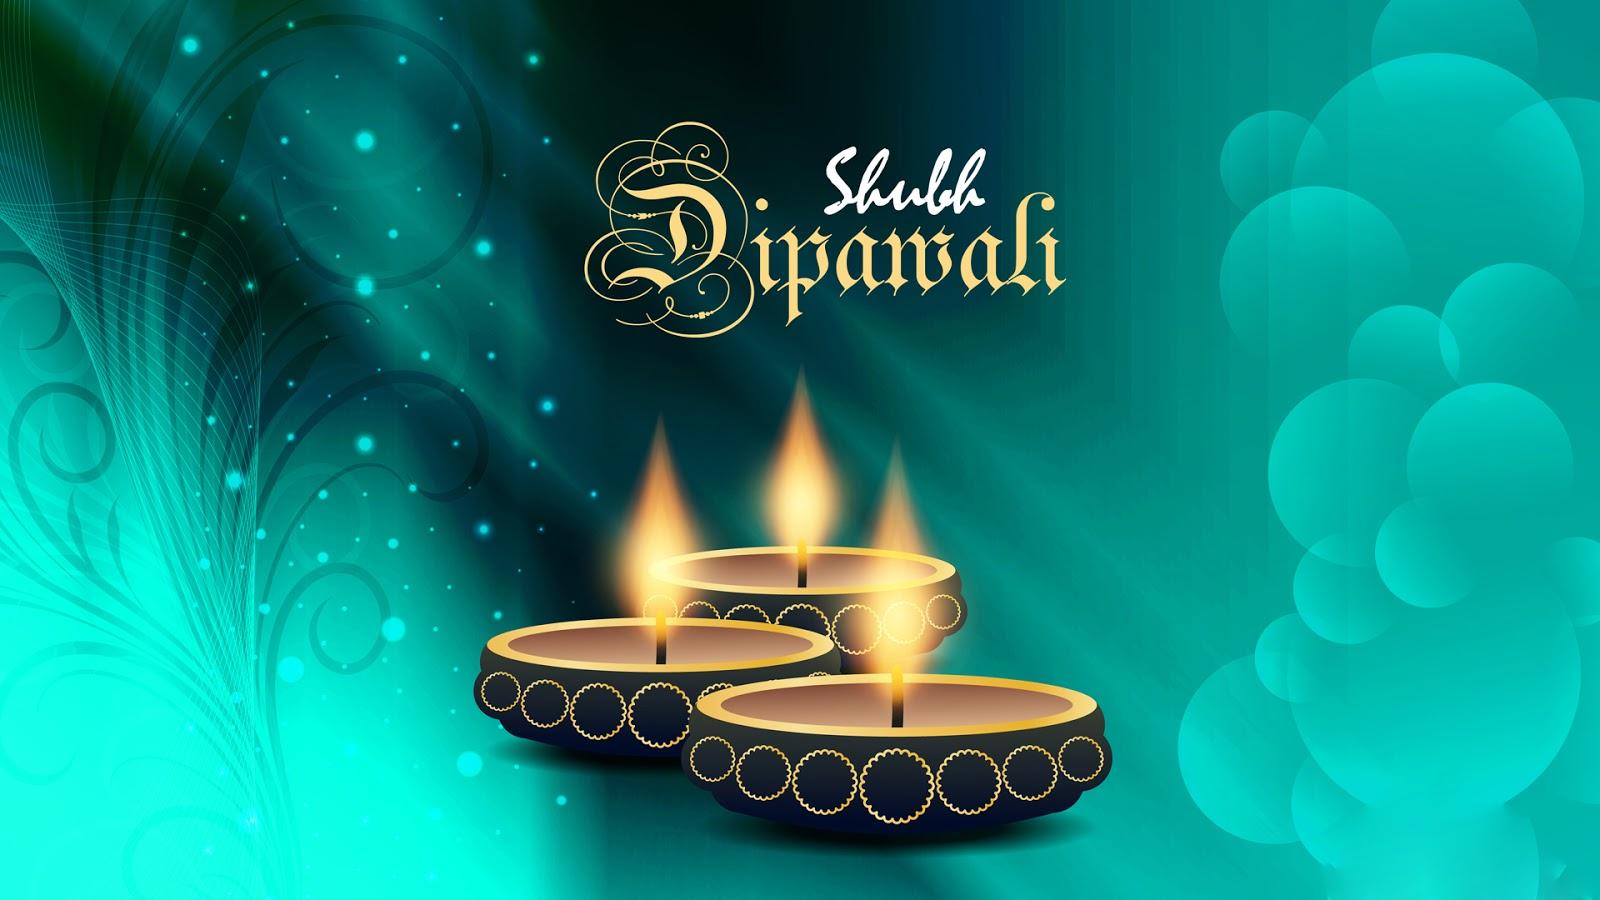 Diwali cards images for 2016 diwali card diwali ecards wishes sms m4hsunfo